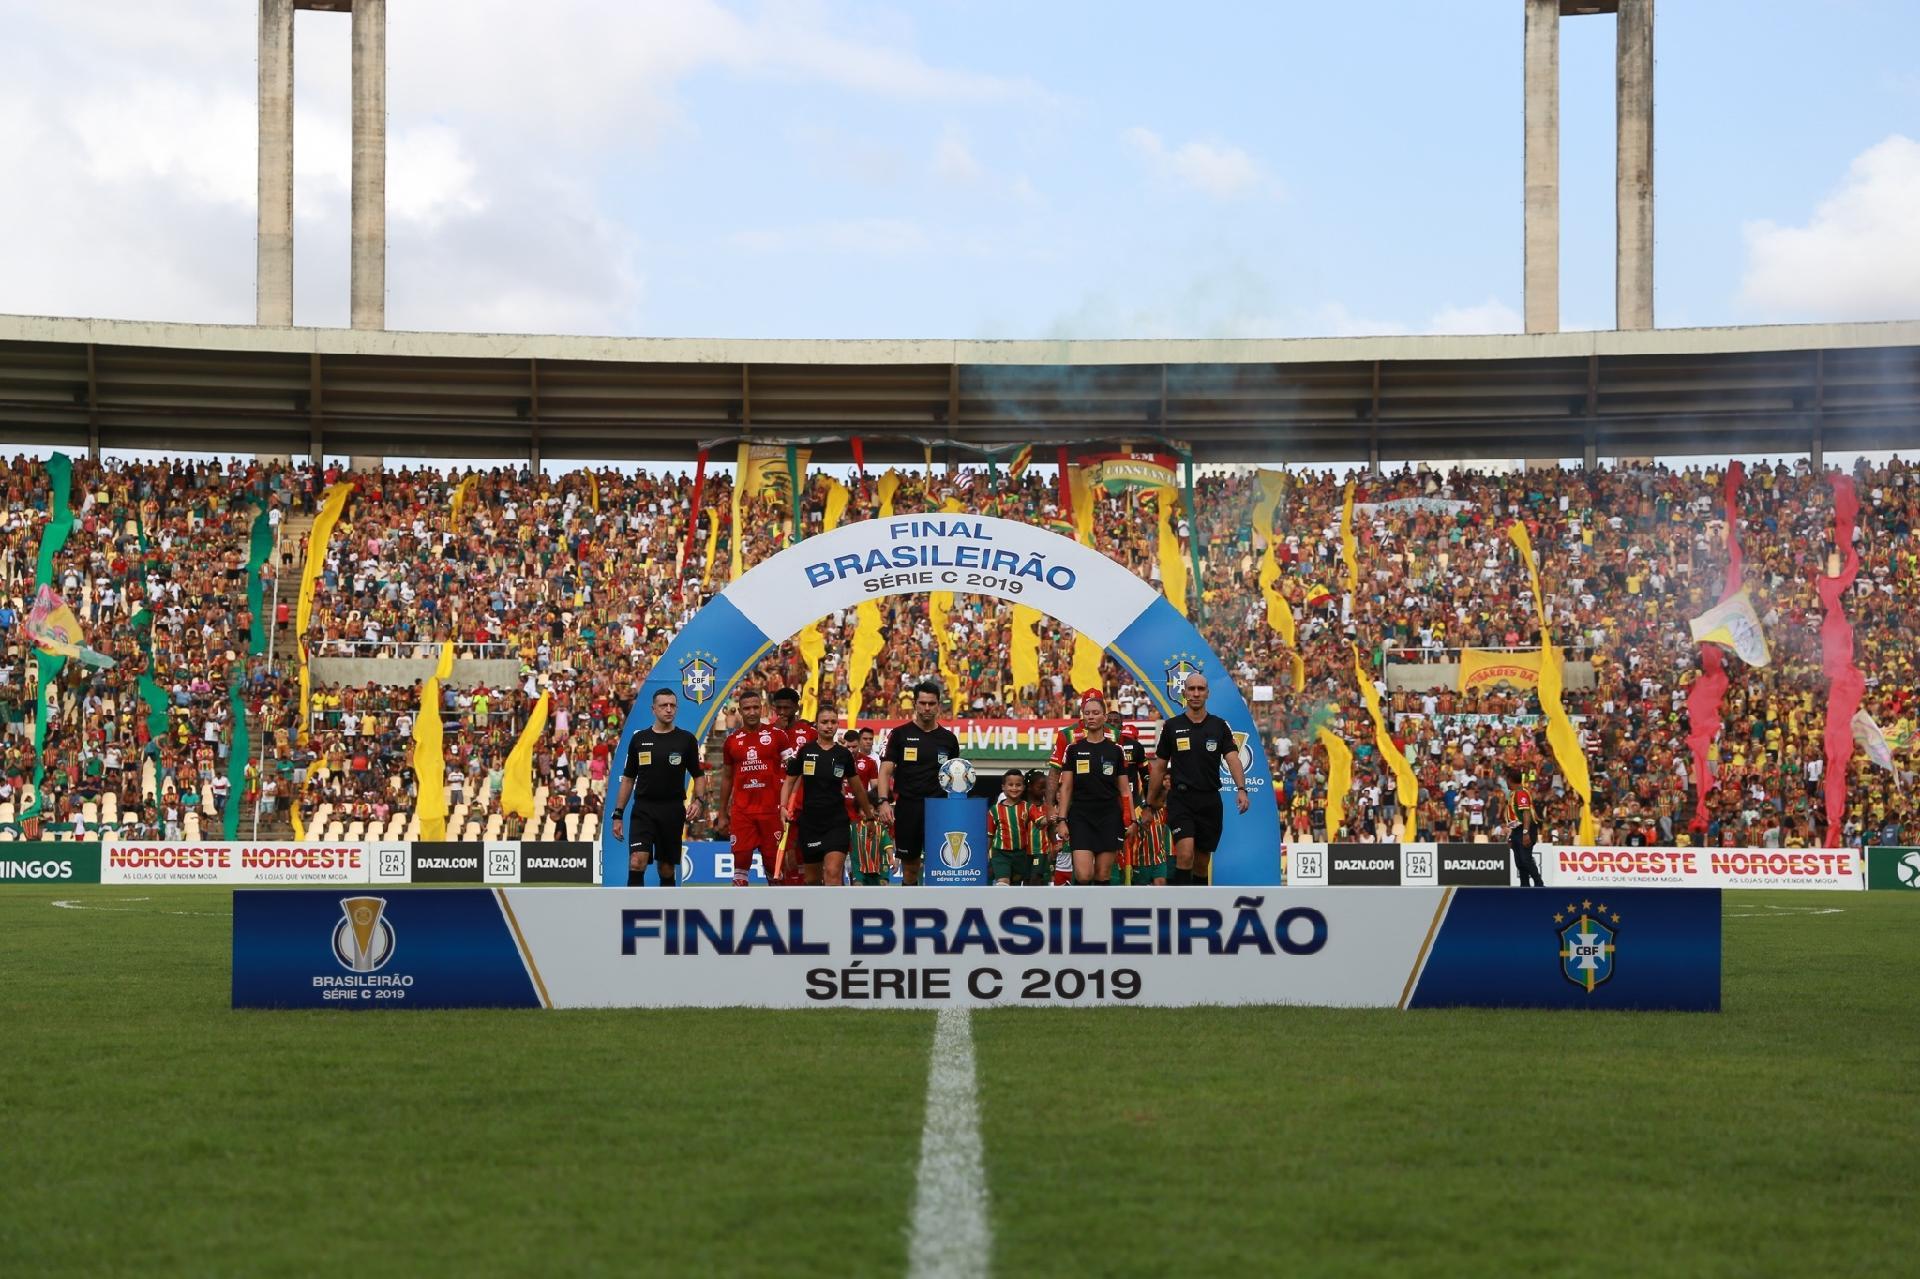 Band Renova Acordo E Exibira Jogos Da Serie C Para O Norte E O Nordeste 14 07 2020 Uol Esporte